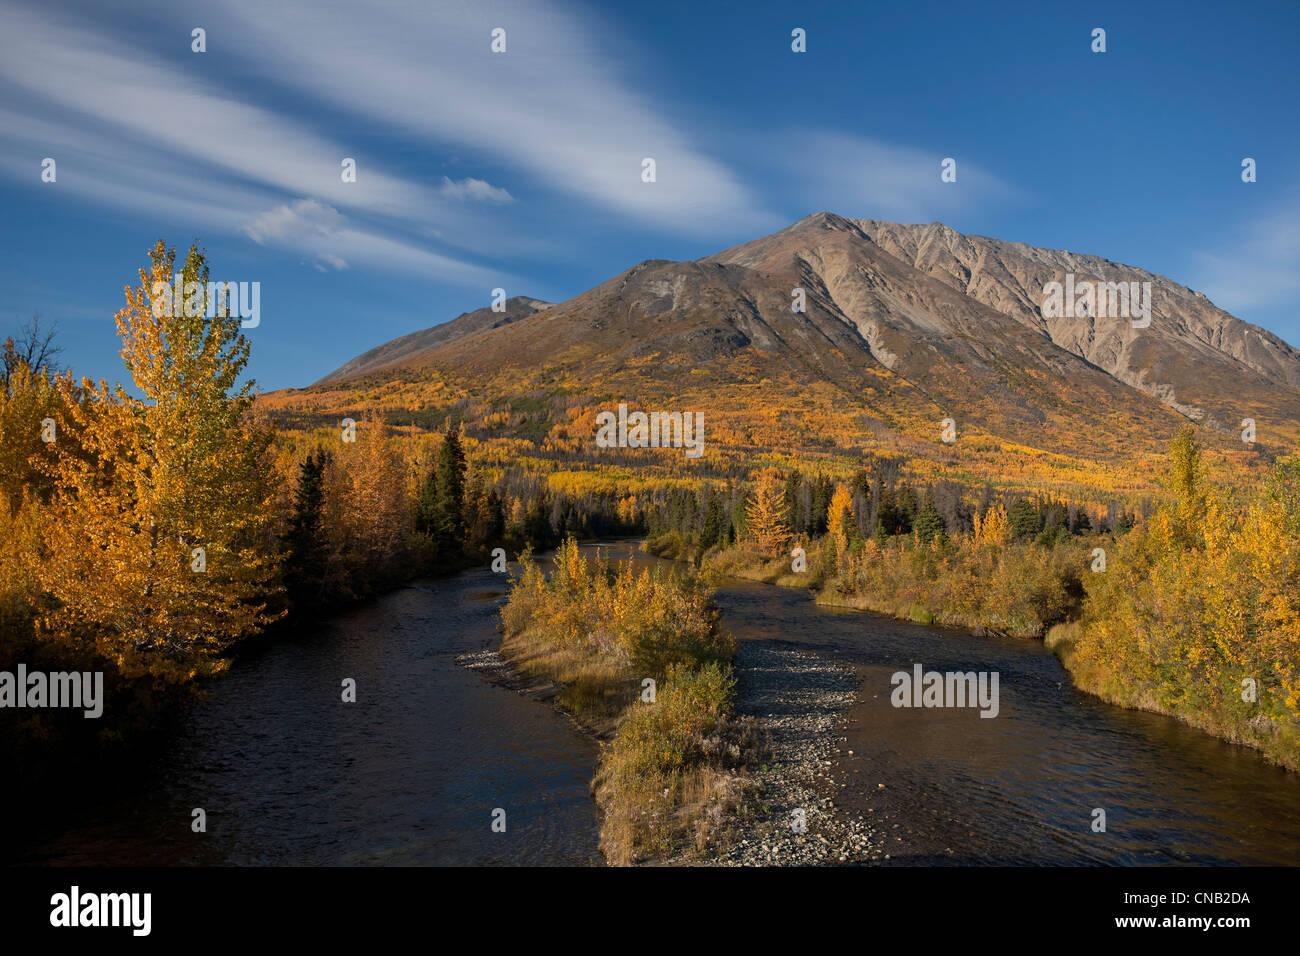 Scenic Autumn view along the Alaska Highway near the Million Dollar Falls campground, Takhani River, Yukon Territory, - Stock Image